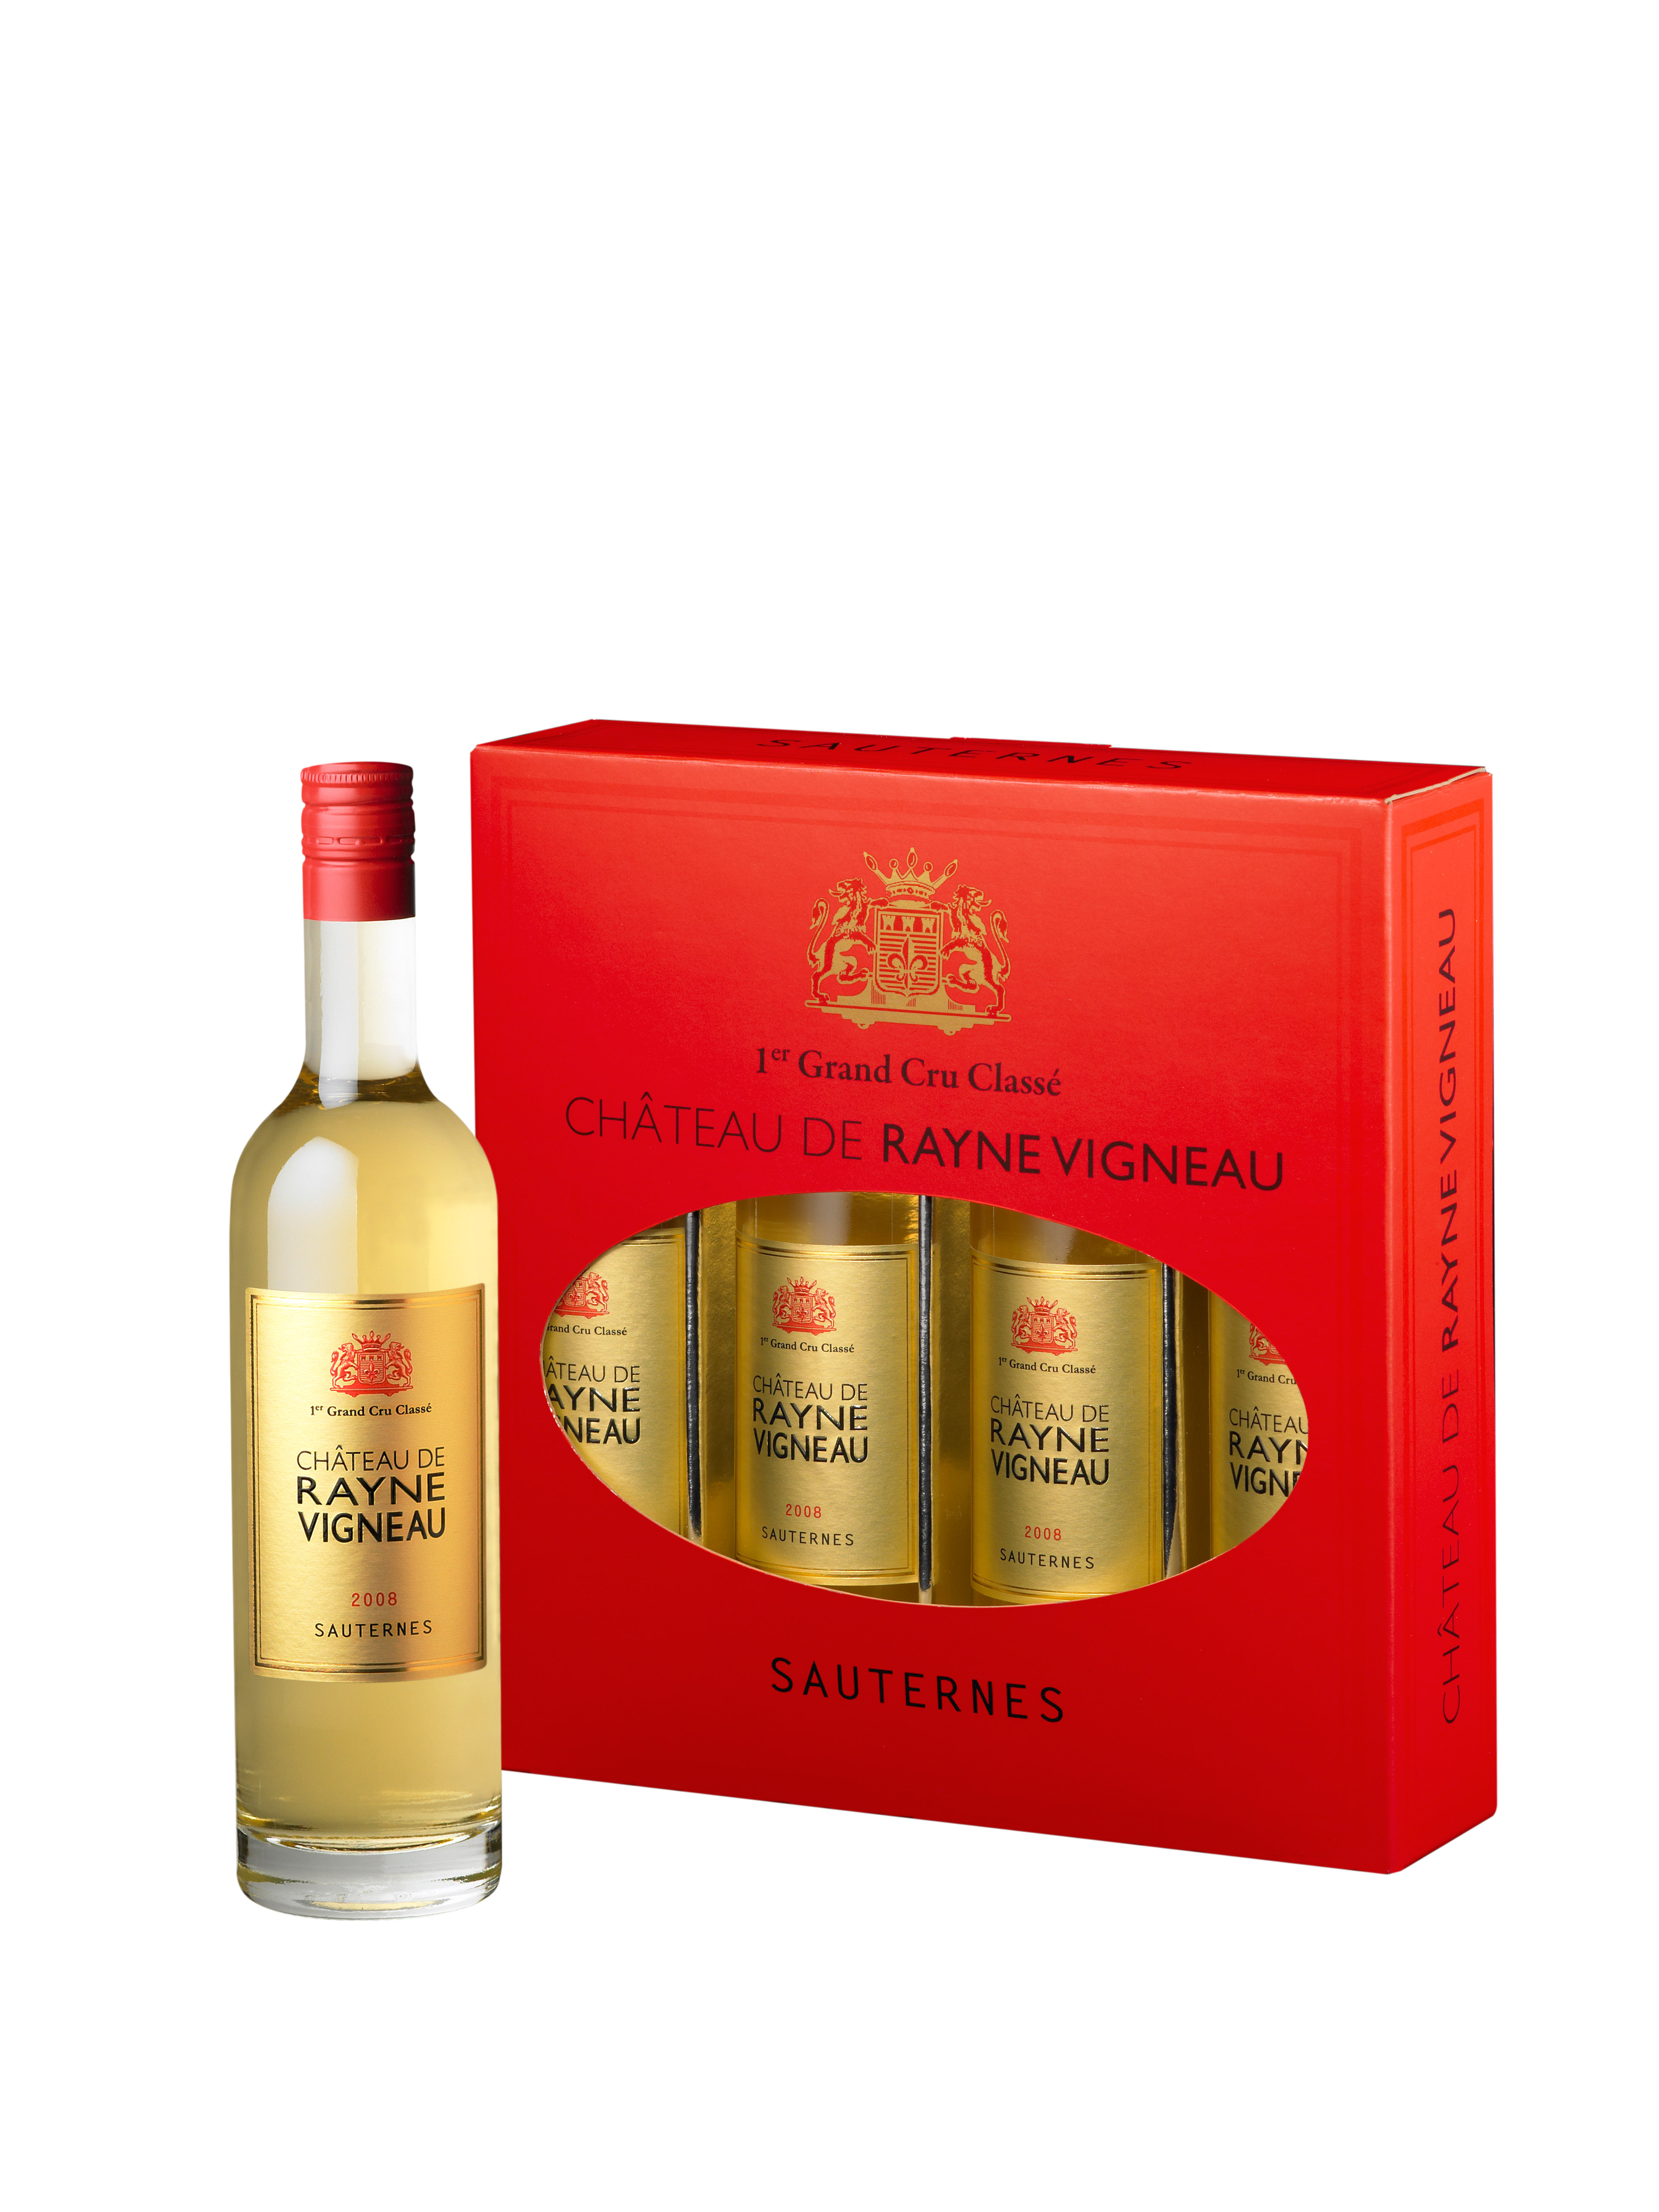 Chateau Rayne Vigneau offers smaller, designer Sauternes bottles